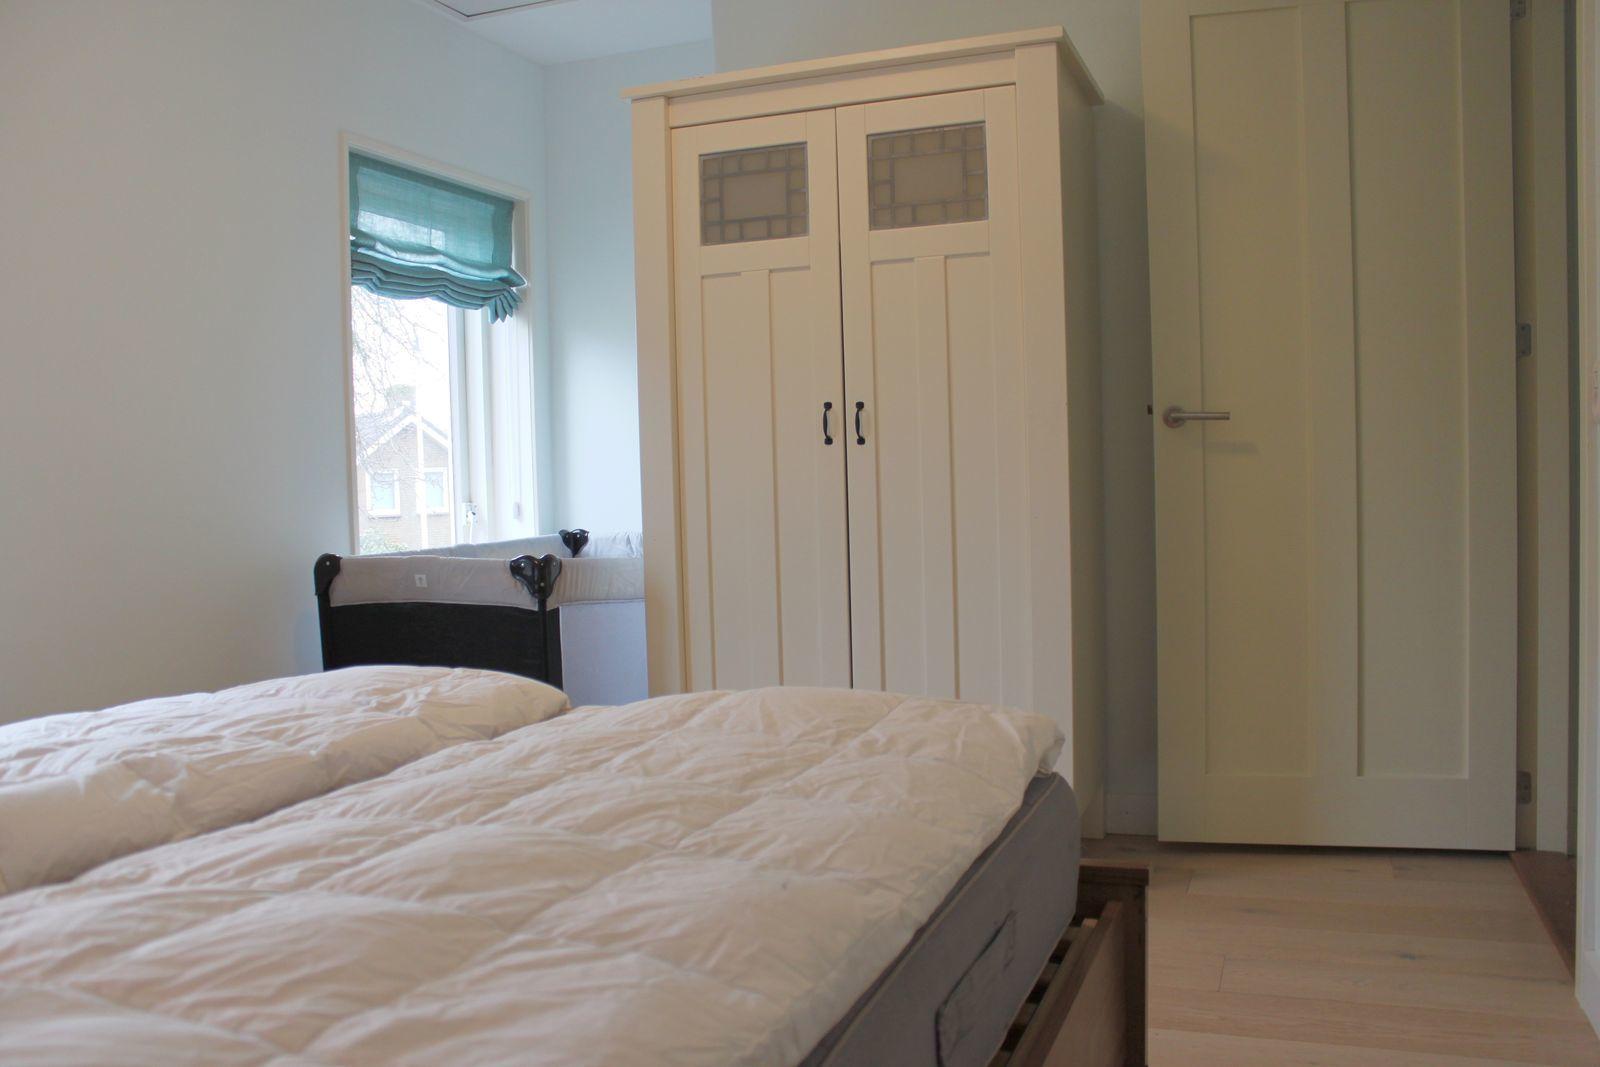 Appartement Hofdijksweg (6 persons) - Ouddorp